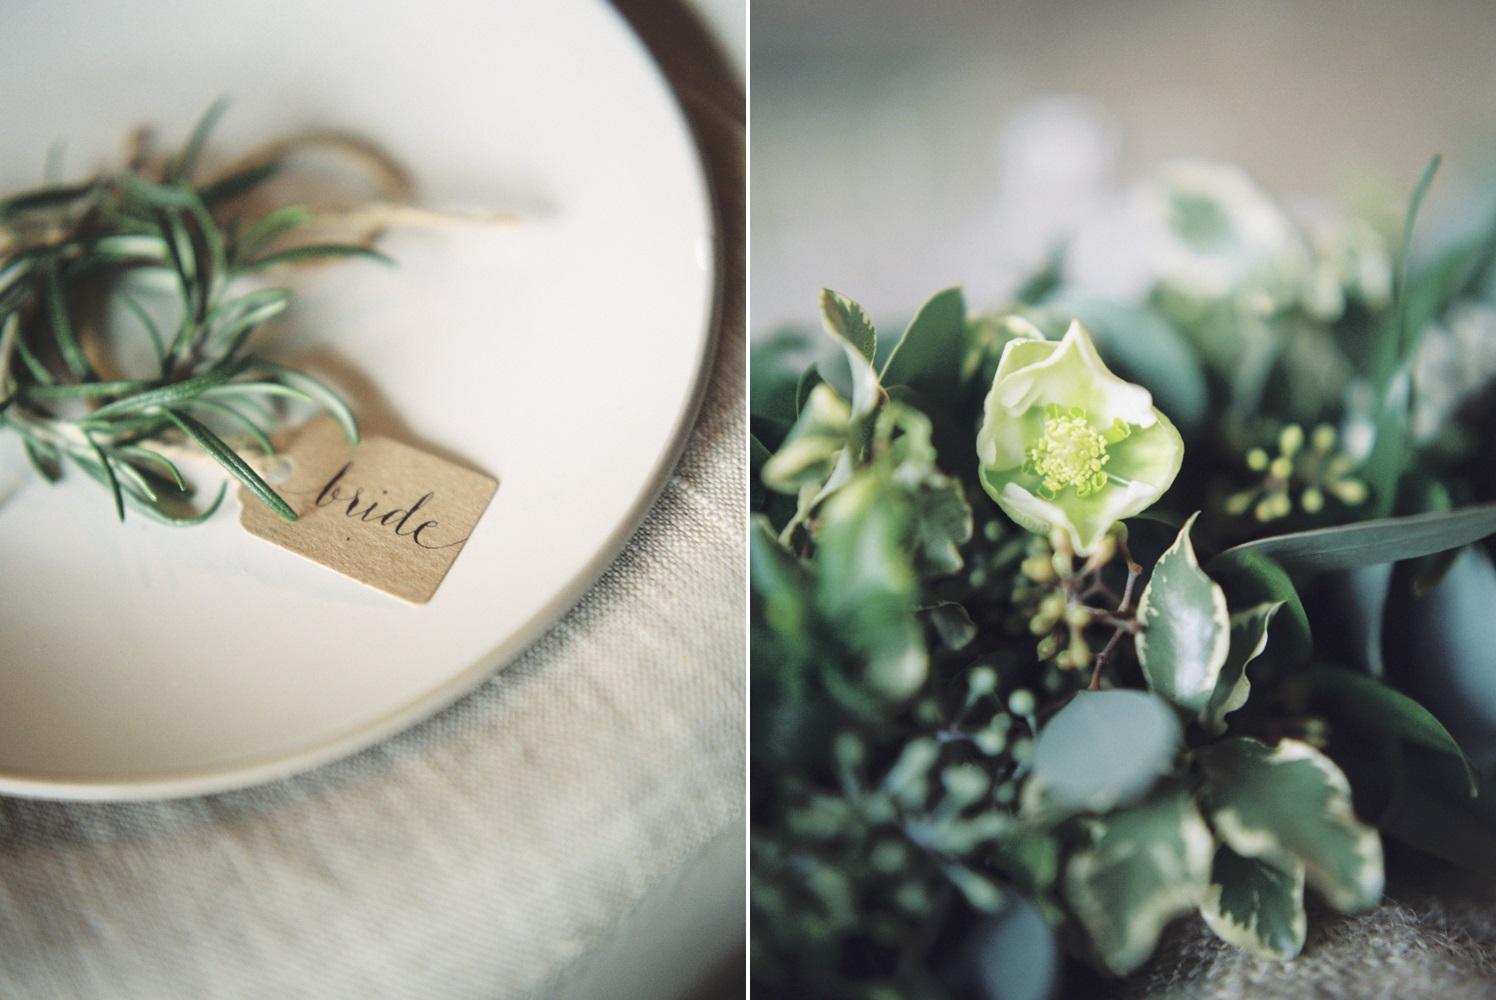 Elegant Rustic Wedding Place Card // Photography ~ Theresa Furey